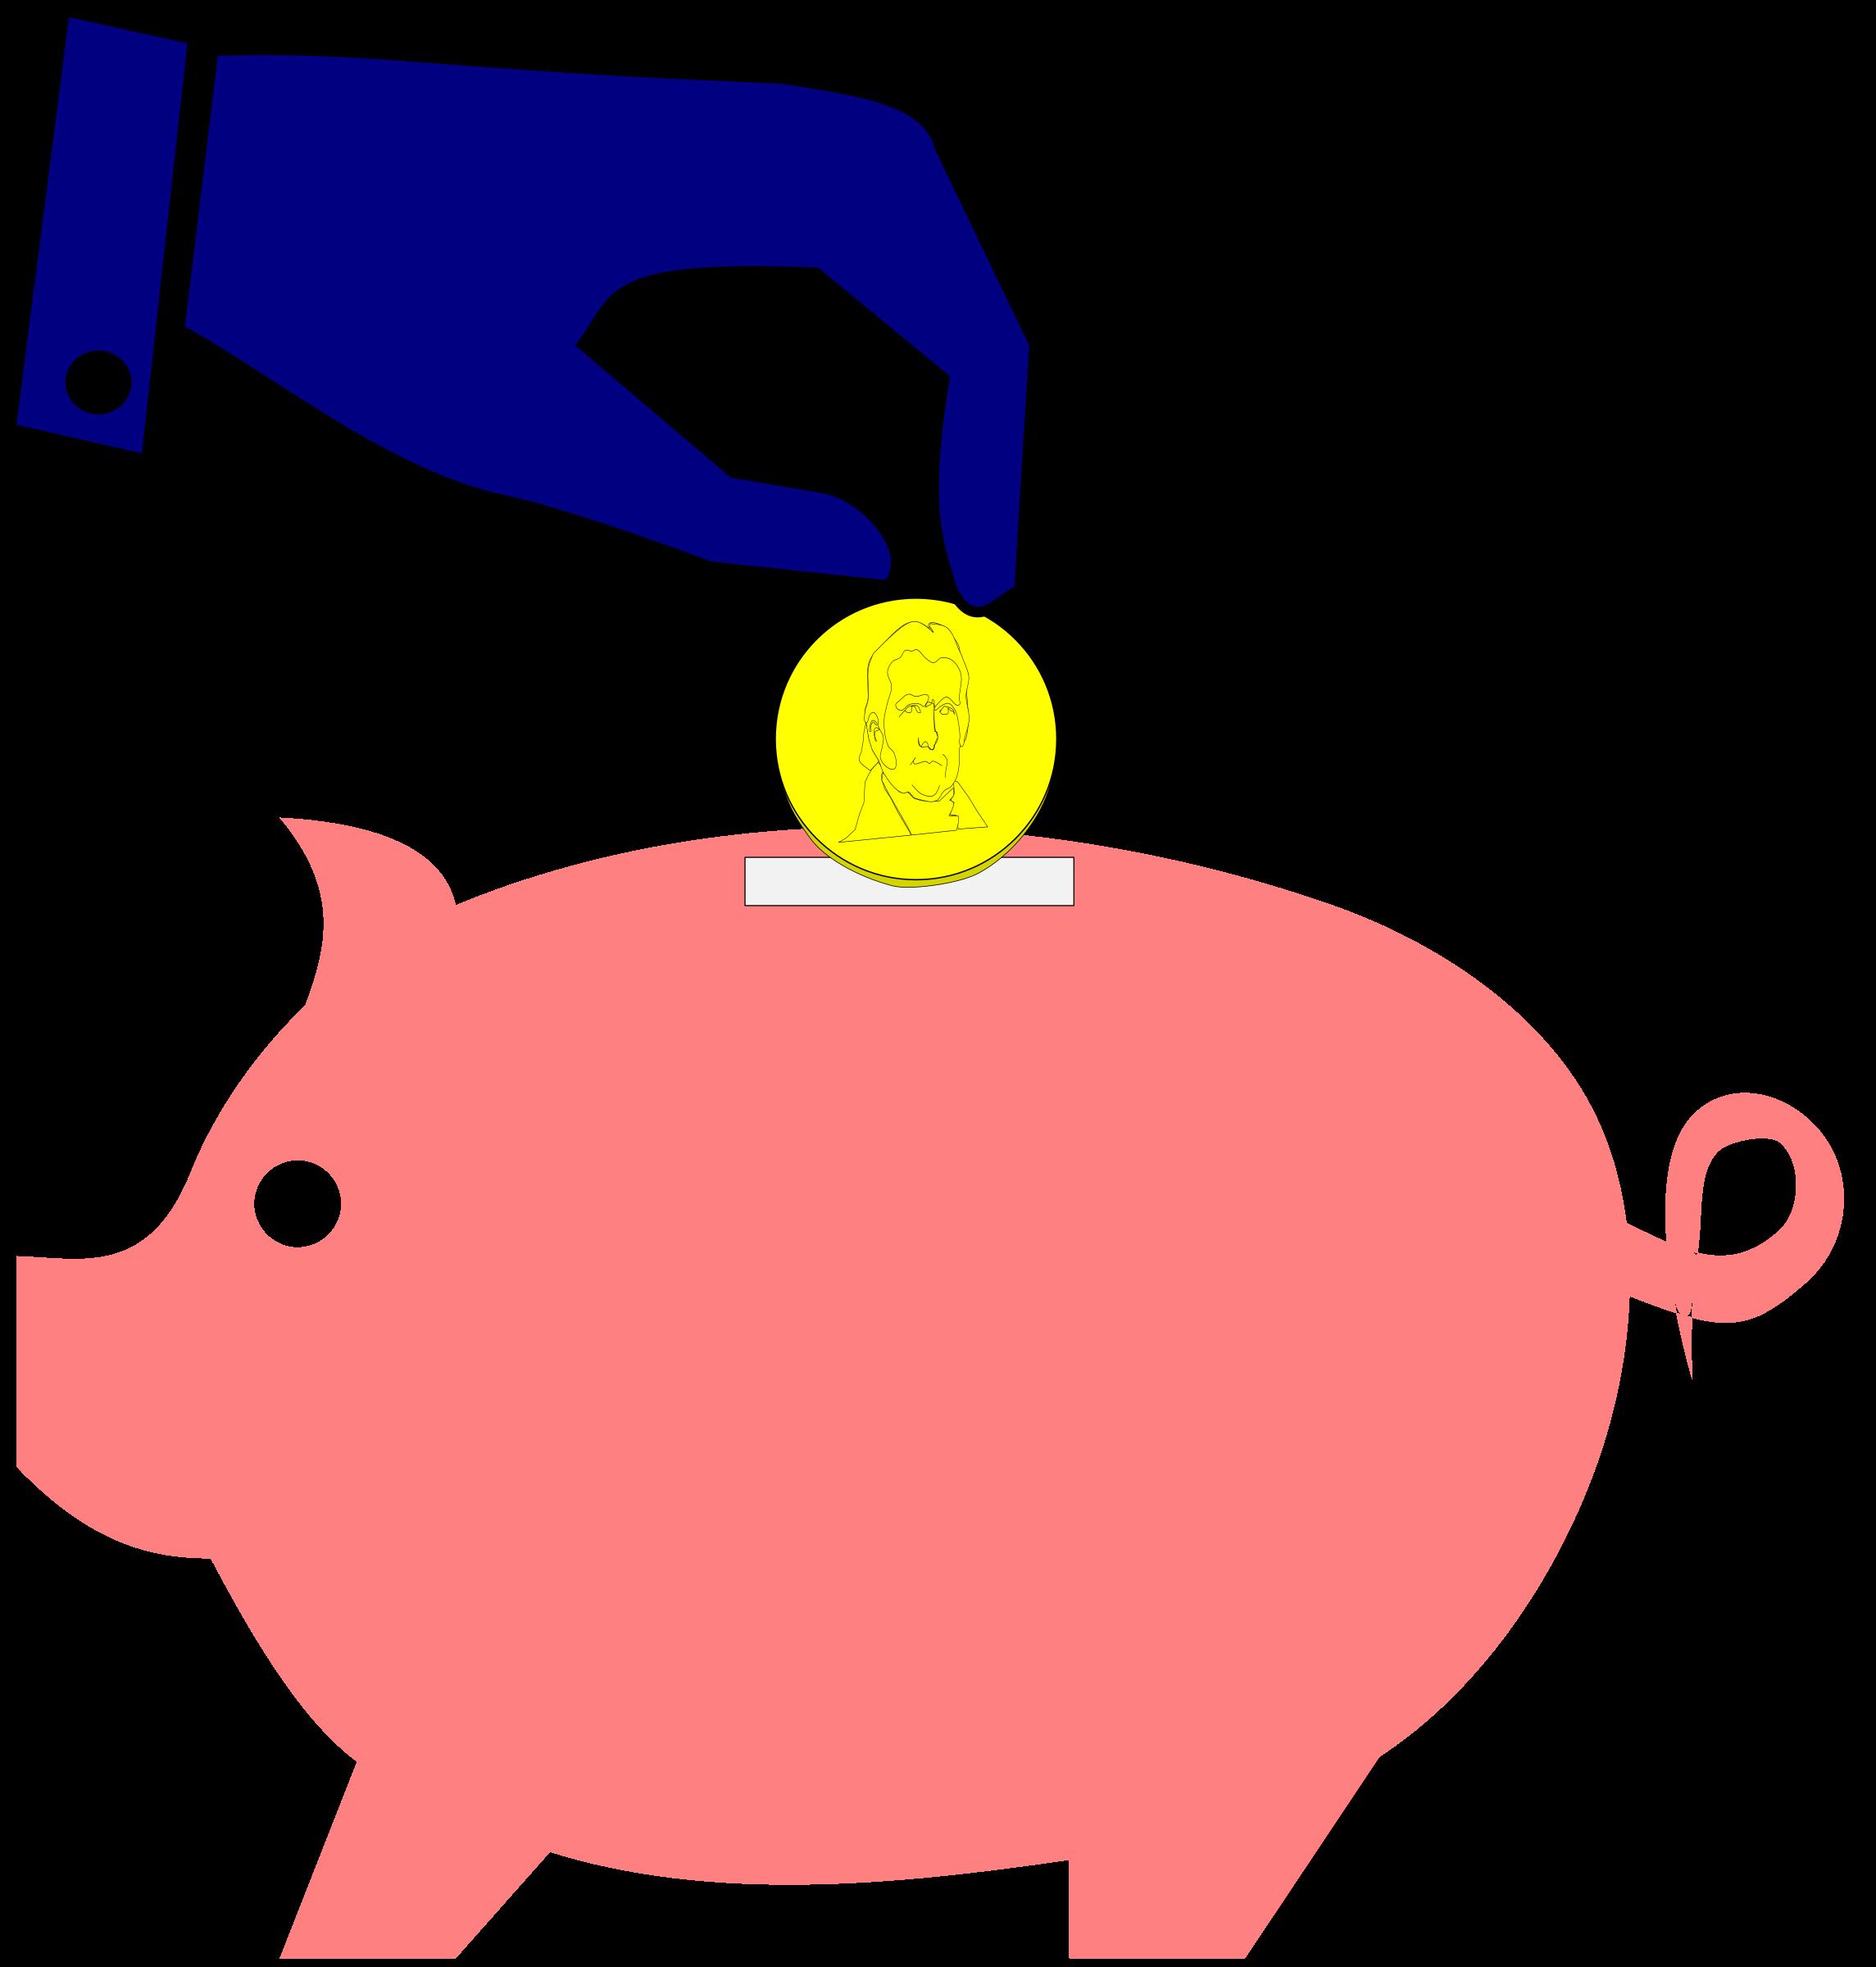 Piggybank Hand + Coin by algotruneman